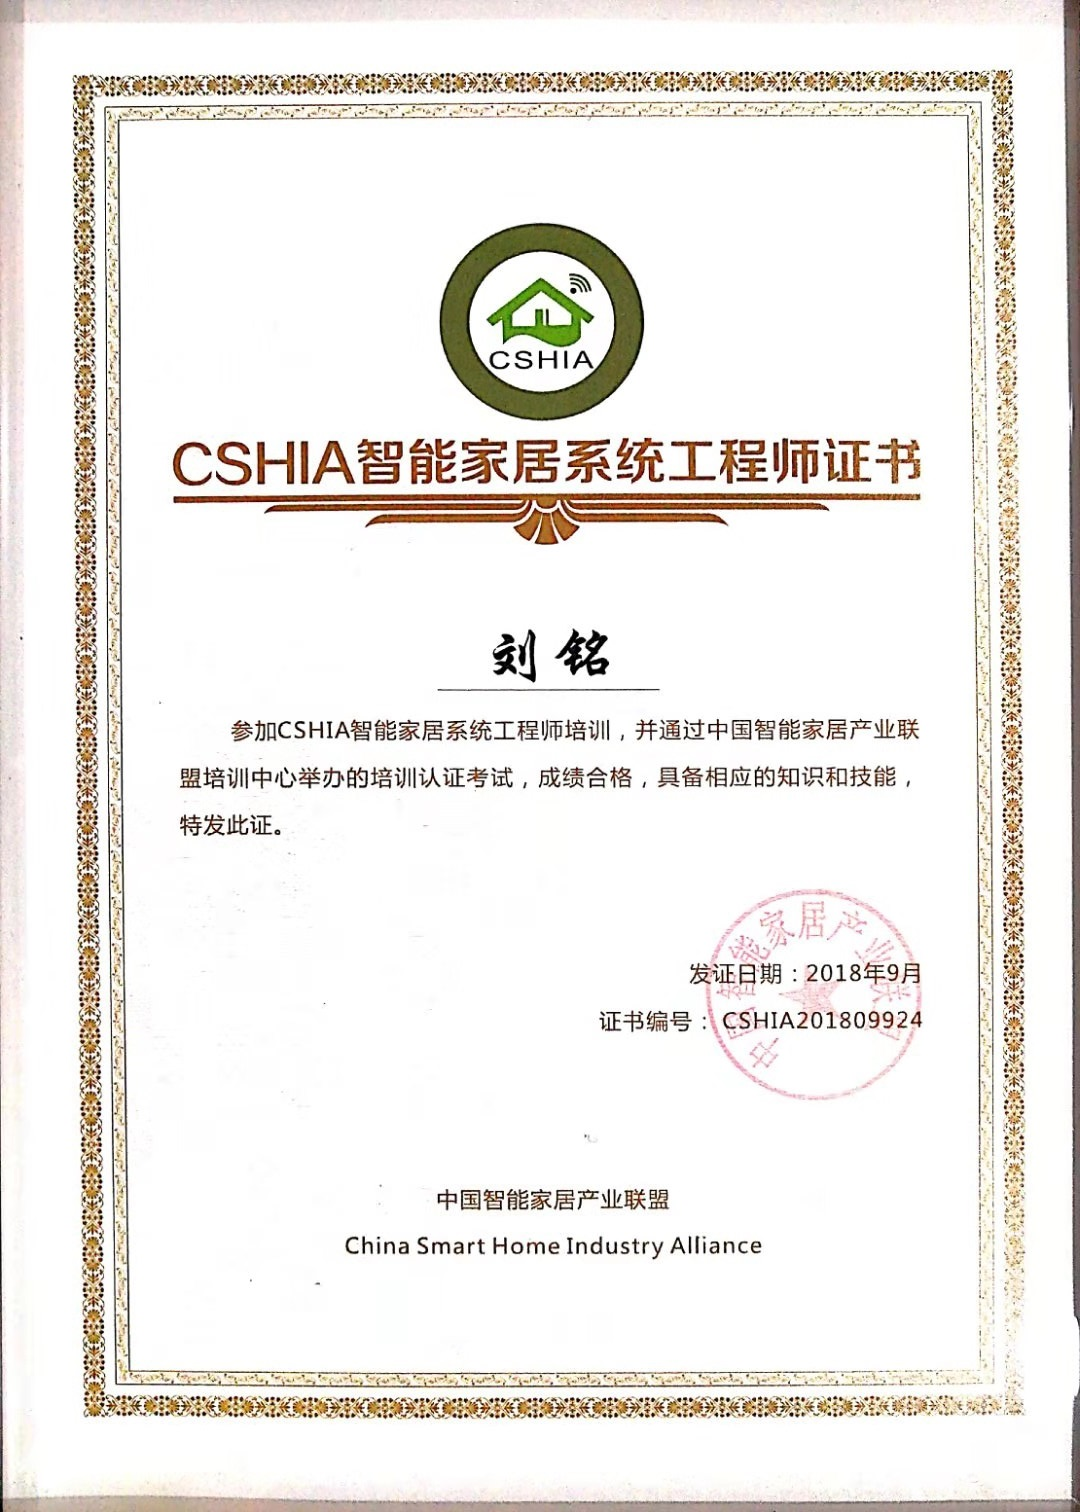 CSHIA番茄视频系统工程师证书